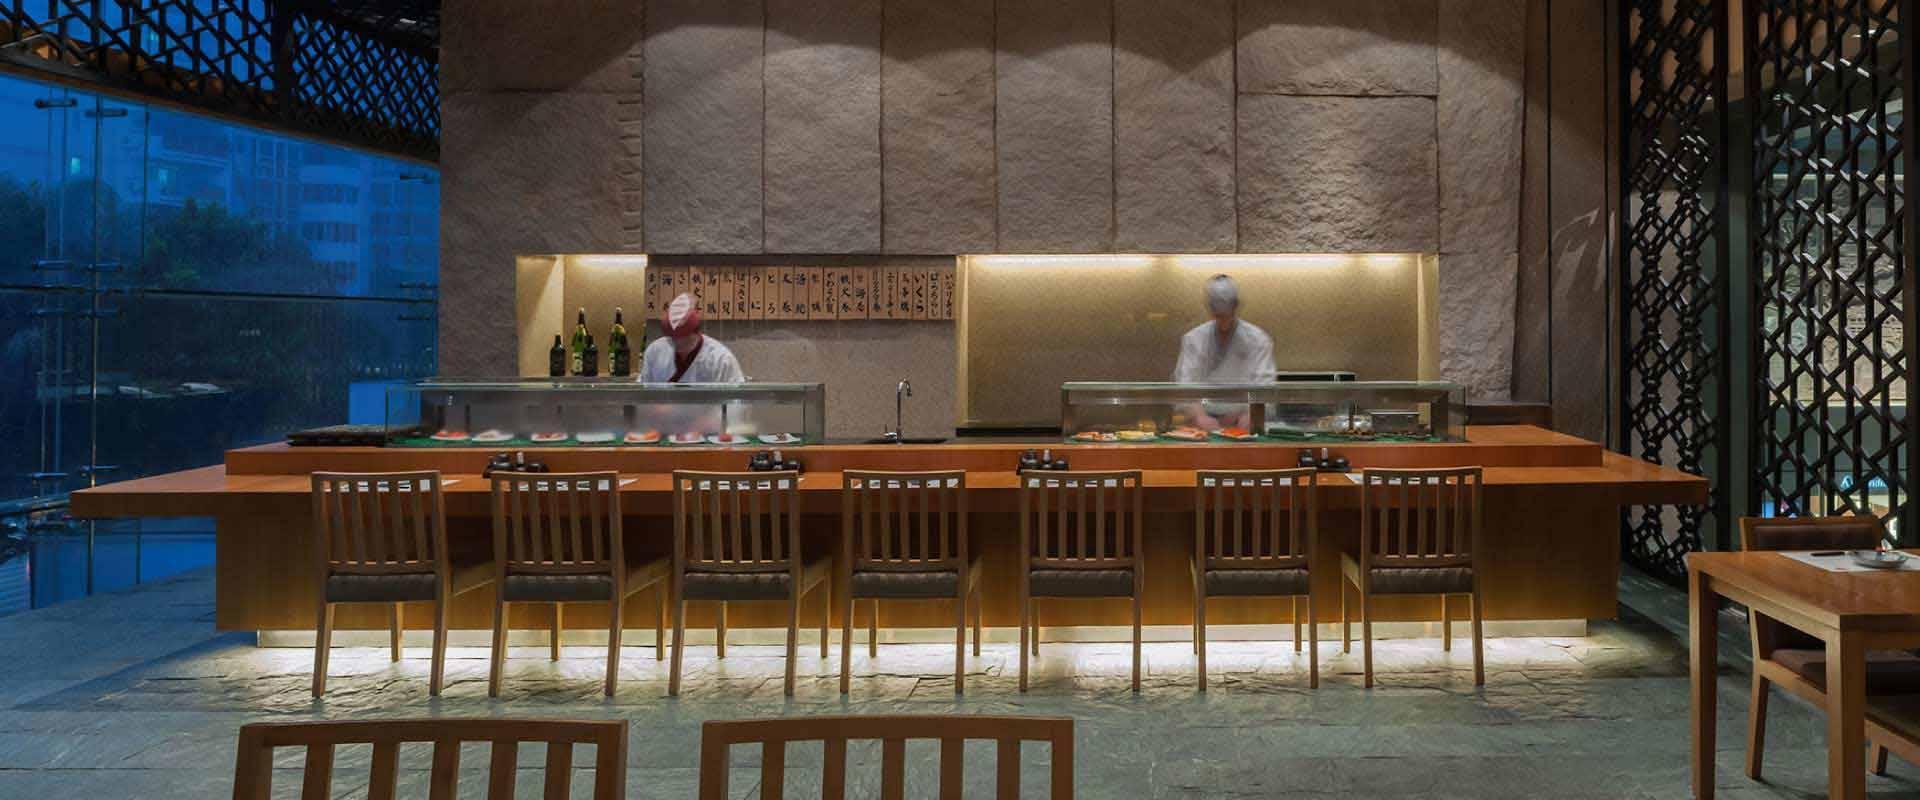 Restaurants Amp Bars Marco Polo Xiamen